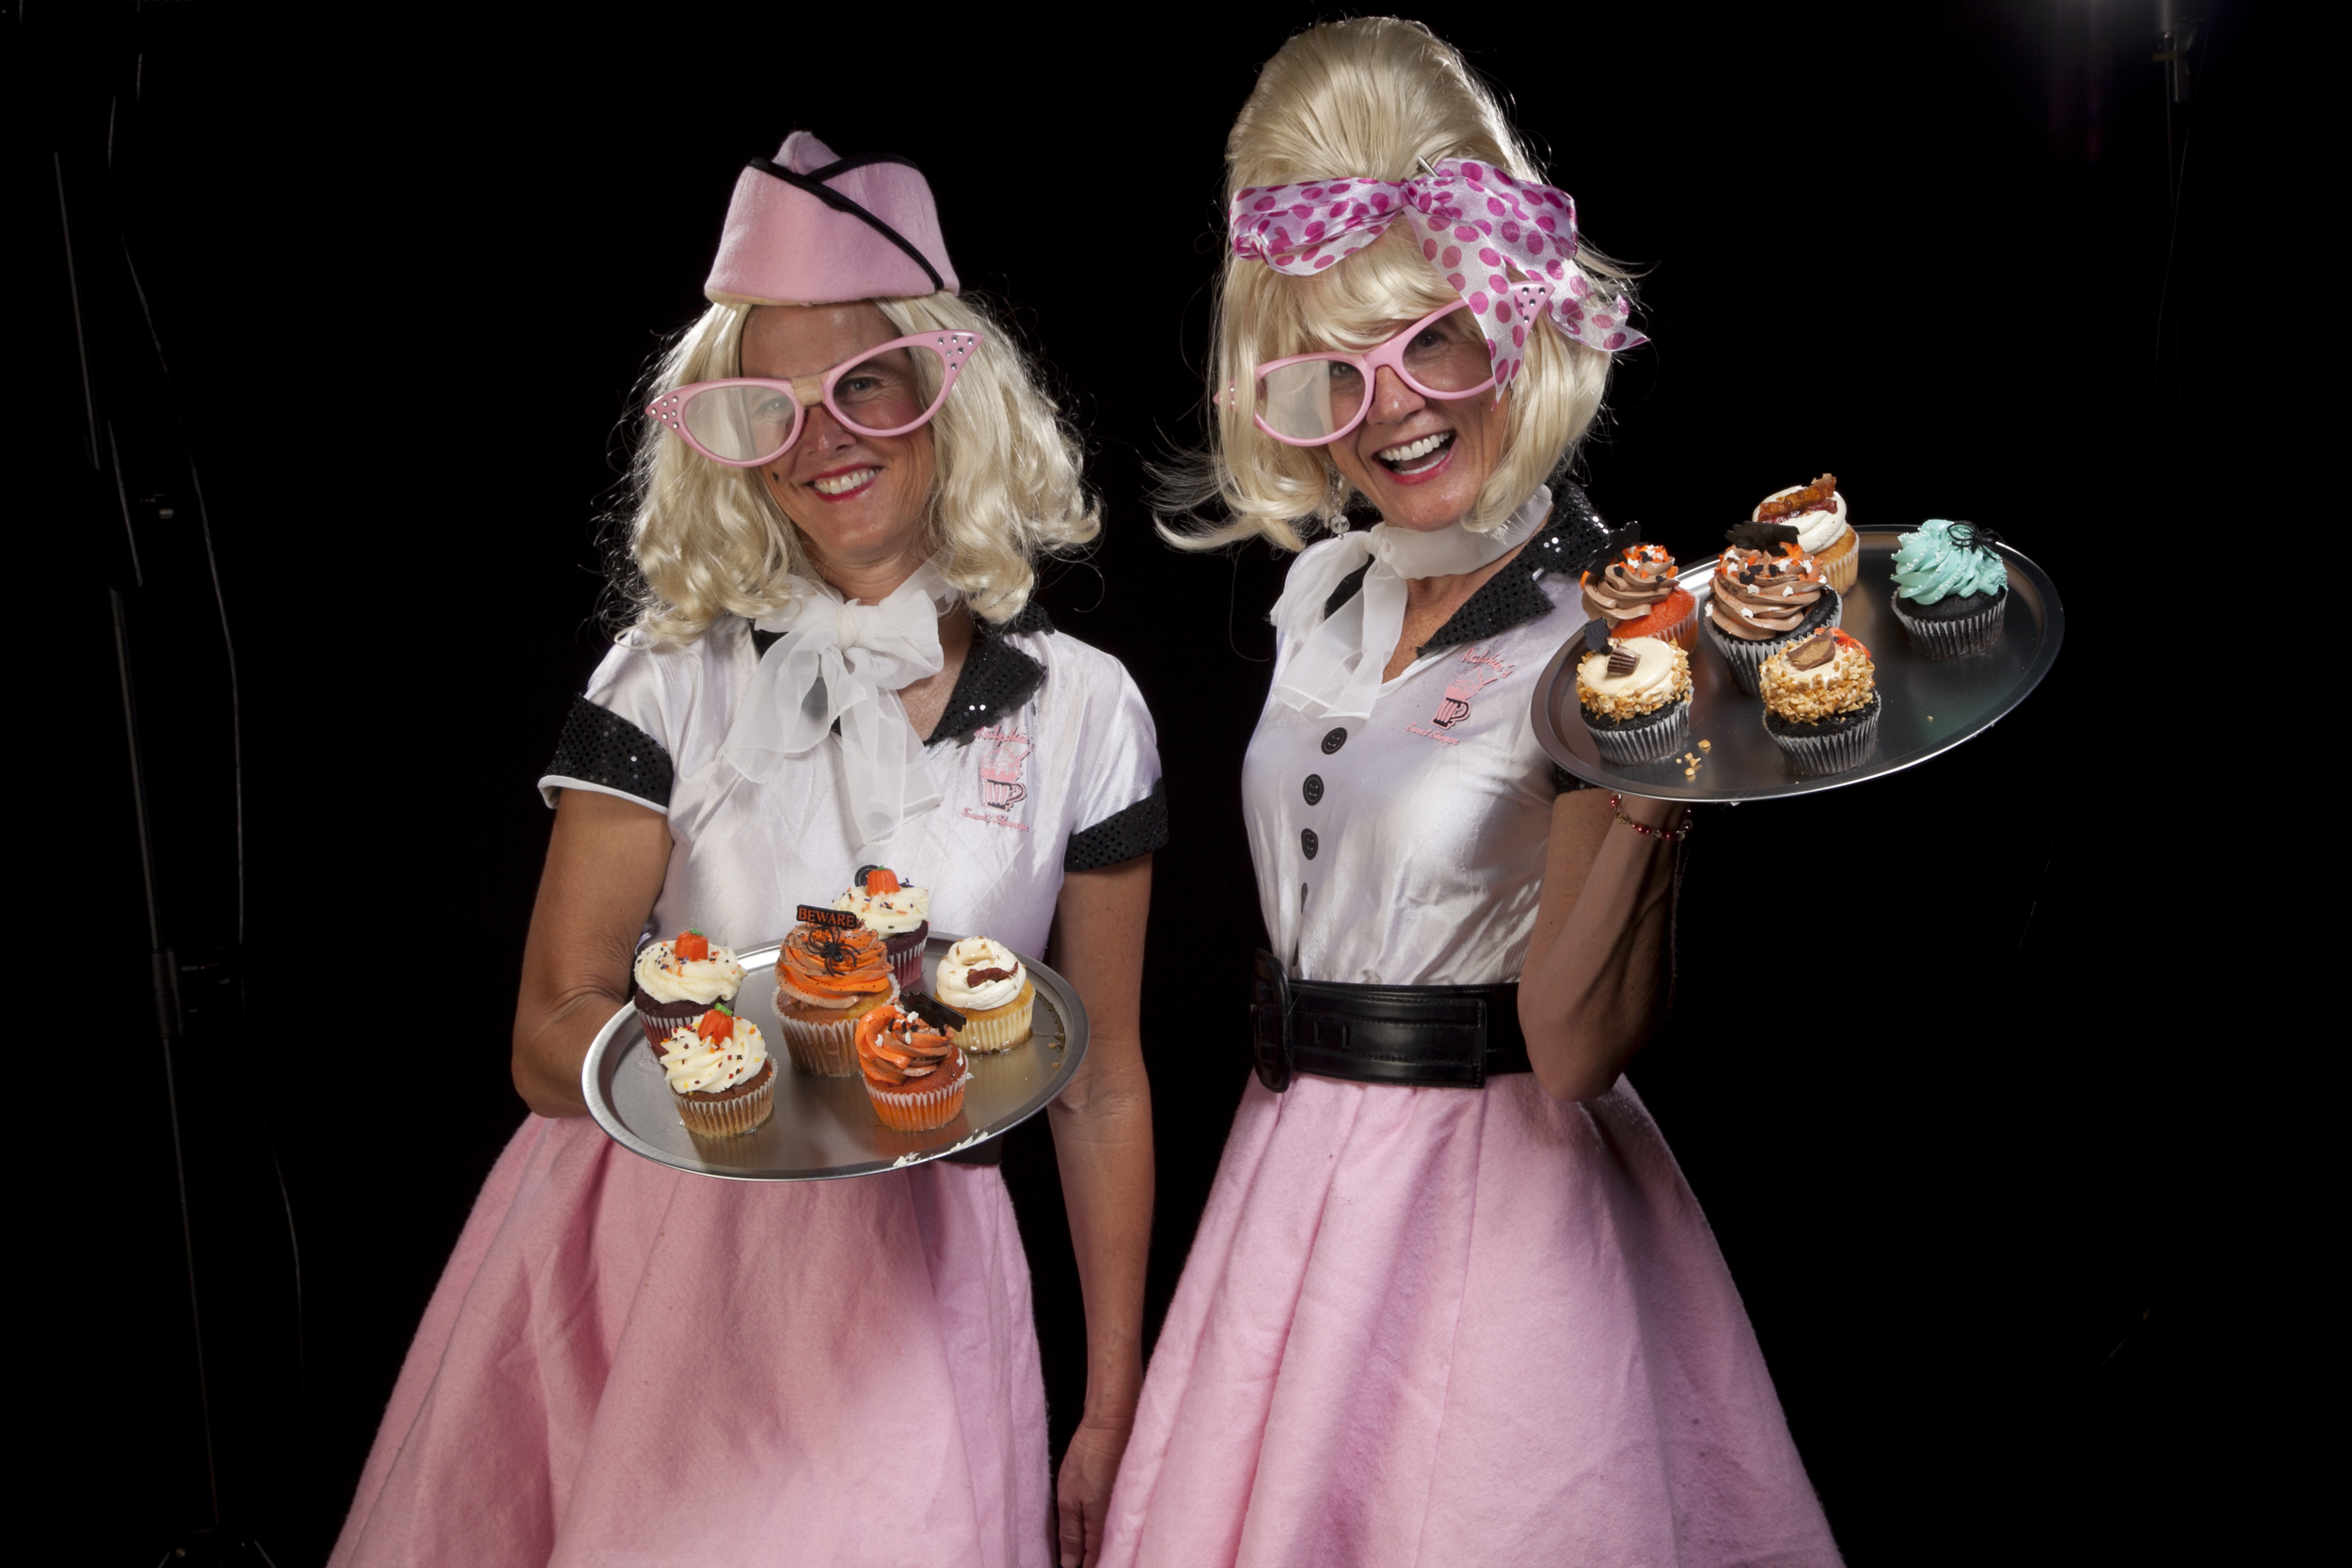 cupcake girlsIMG_4438_1.jpg